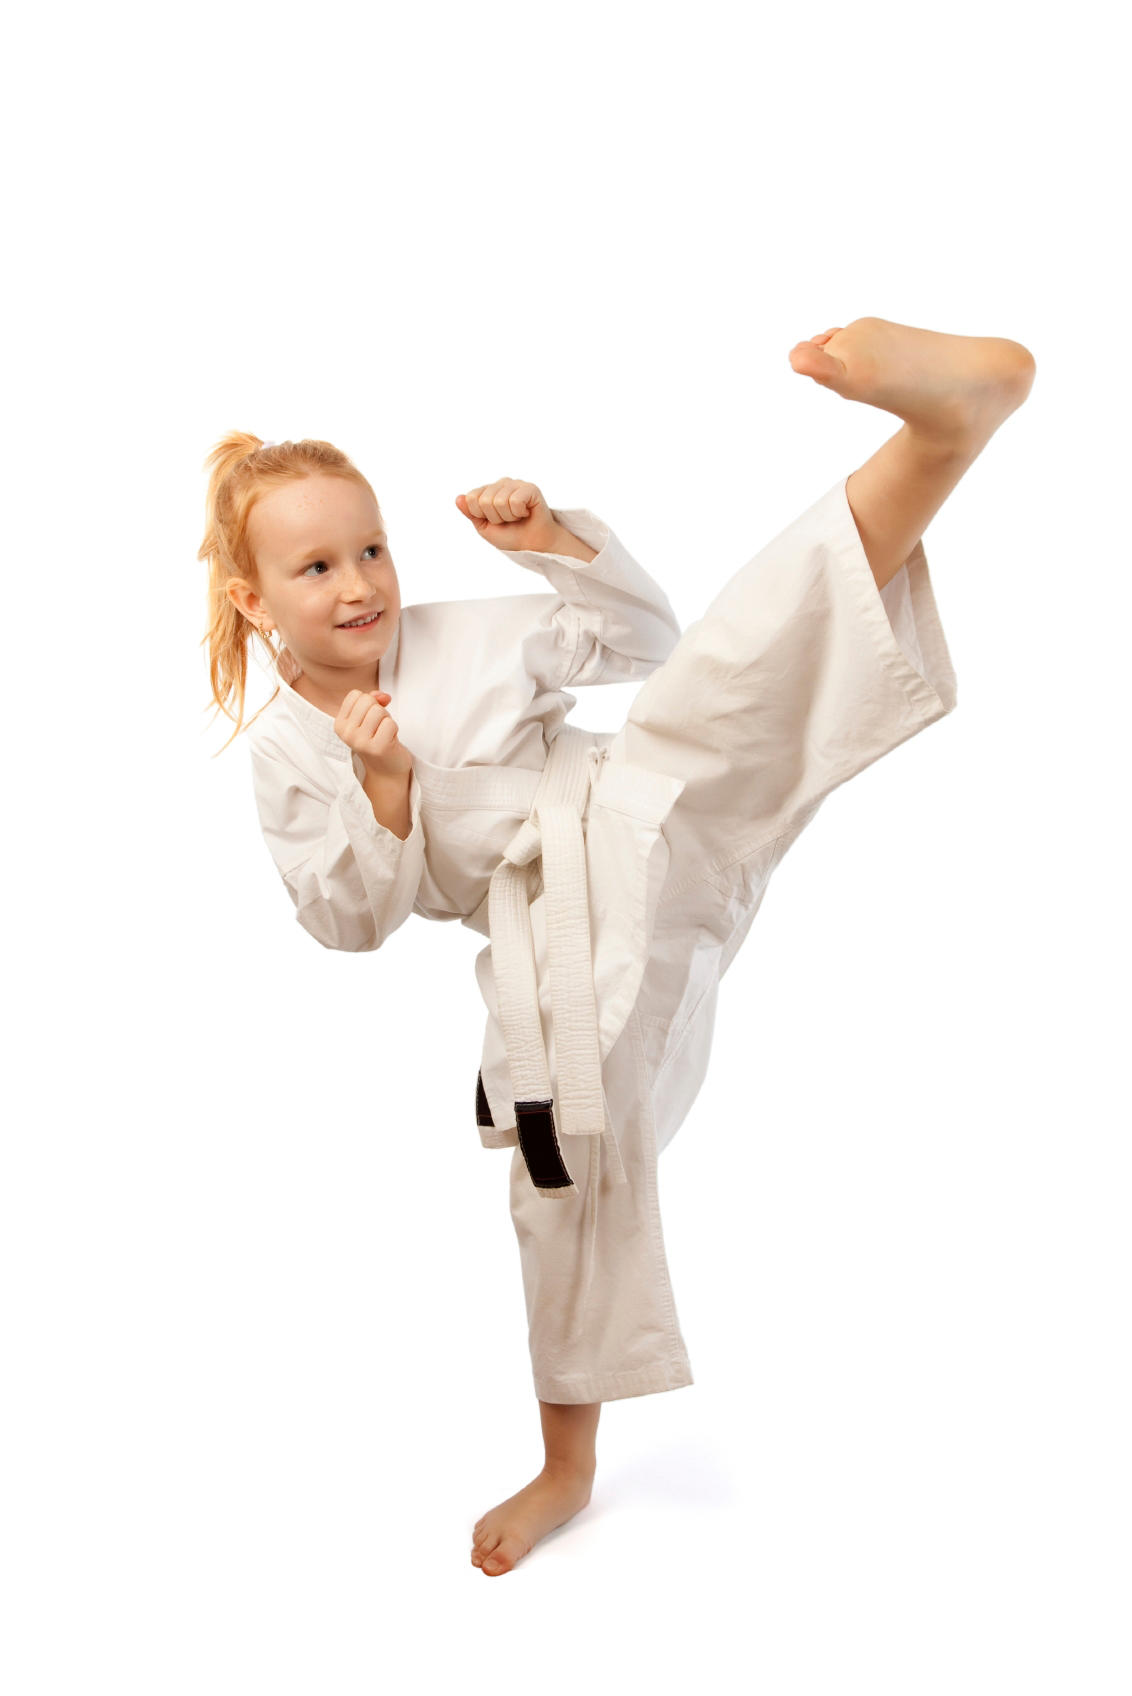 Millennium Martial Arts - Tae Kwon Do image 29